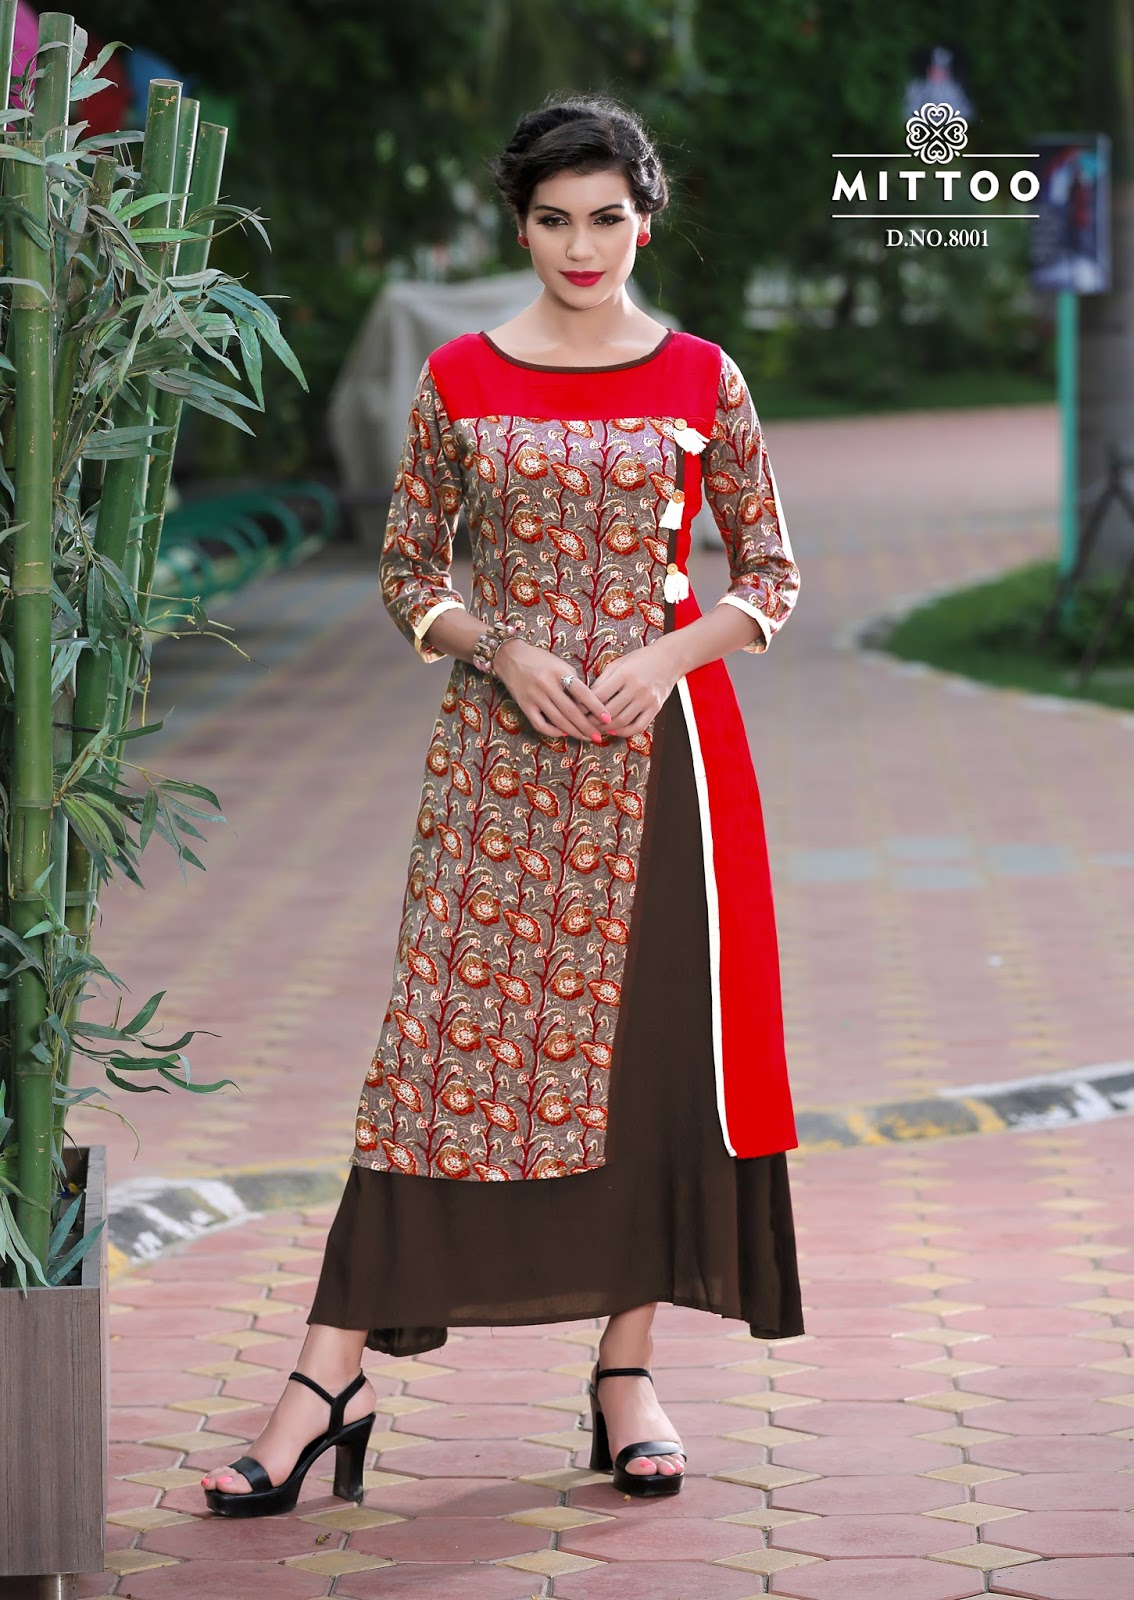 Mittoo-Panghat Vol 1-New Arrival Designer 14kg Rayon Kurti